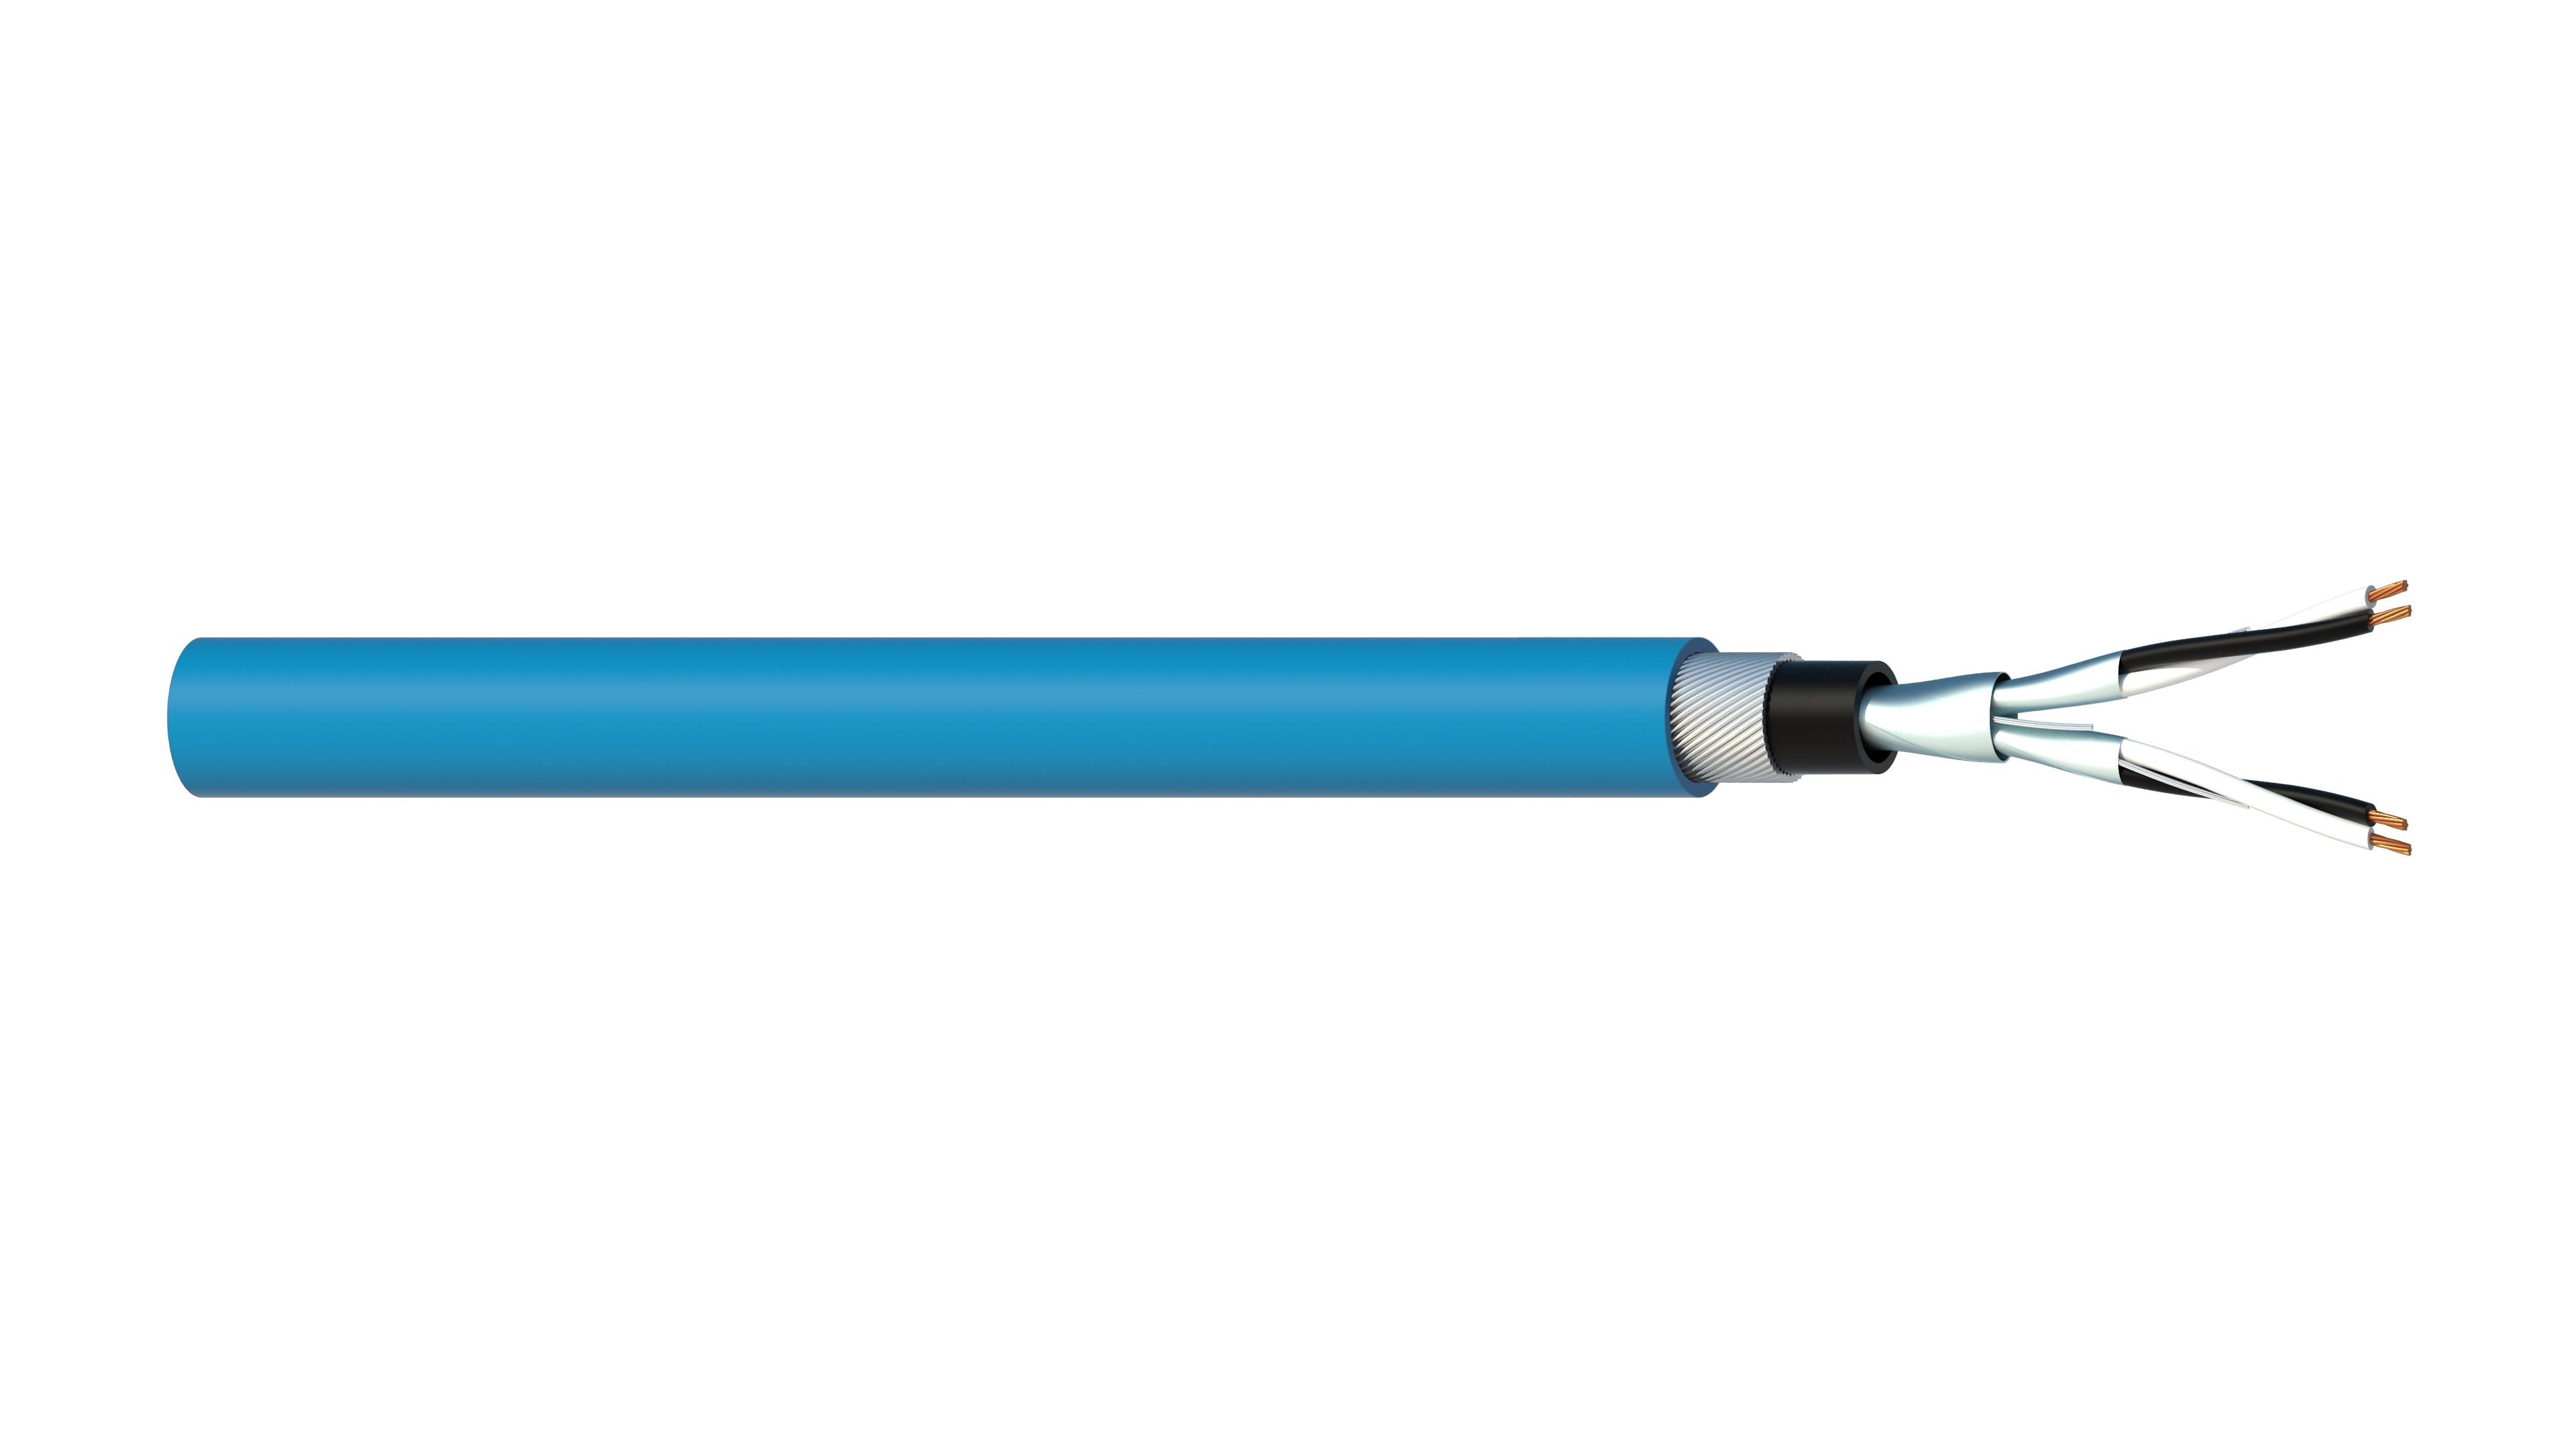 2 Pair 0.5mm2 Cu/PVC/ISOS/PVC/SWA/PVC Maser Instrumentation Cable - Blue Sheath